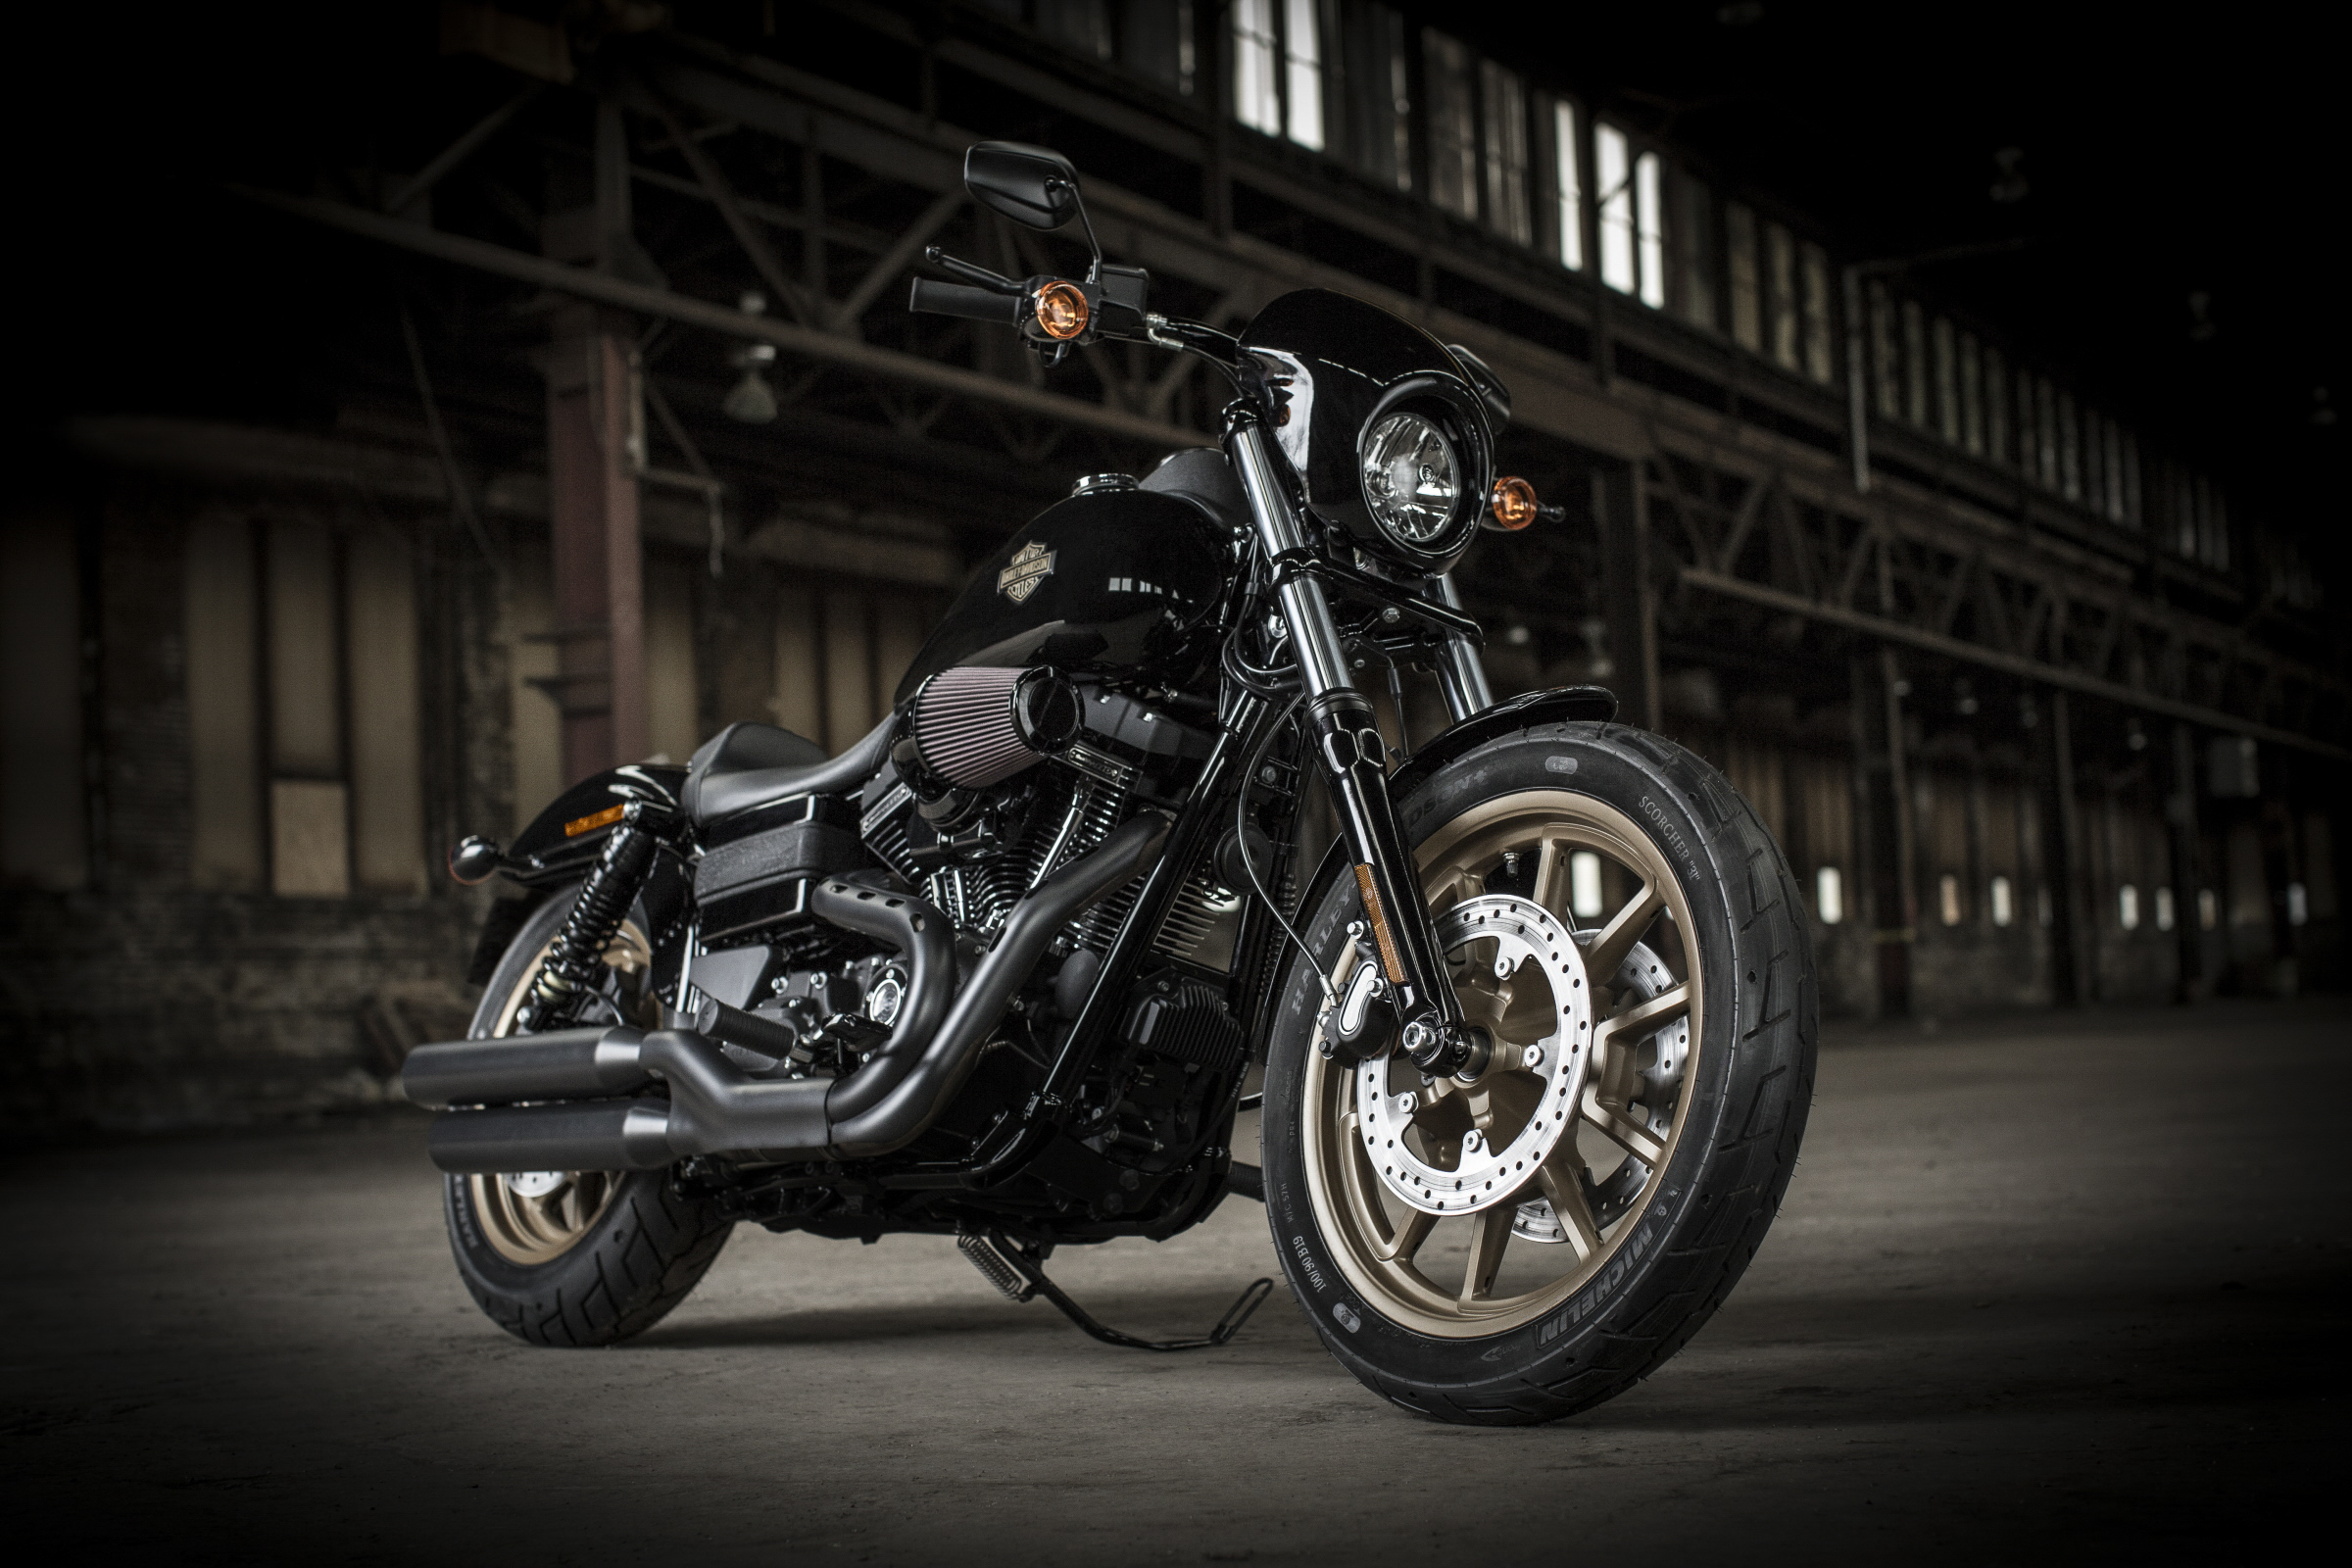 2016 Harley-Davidson Low Rider S.